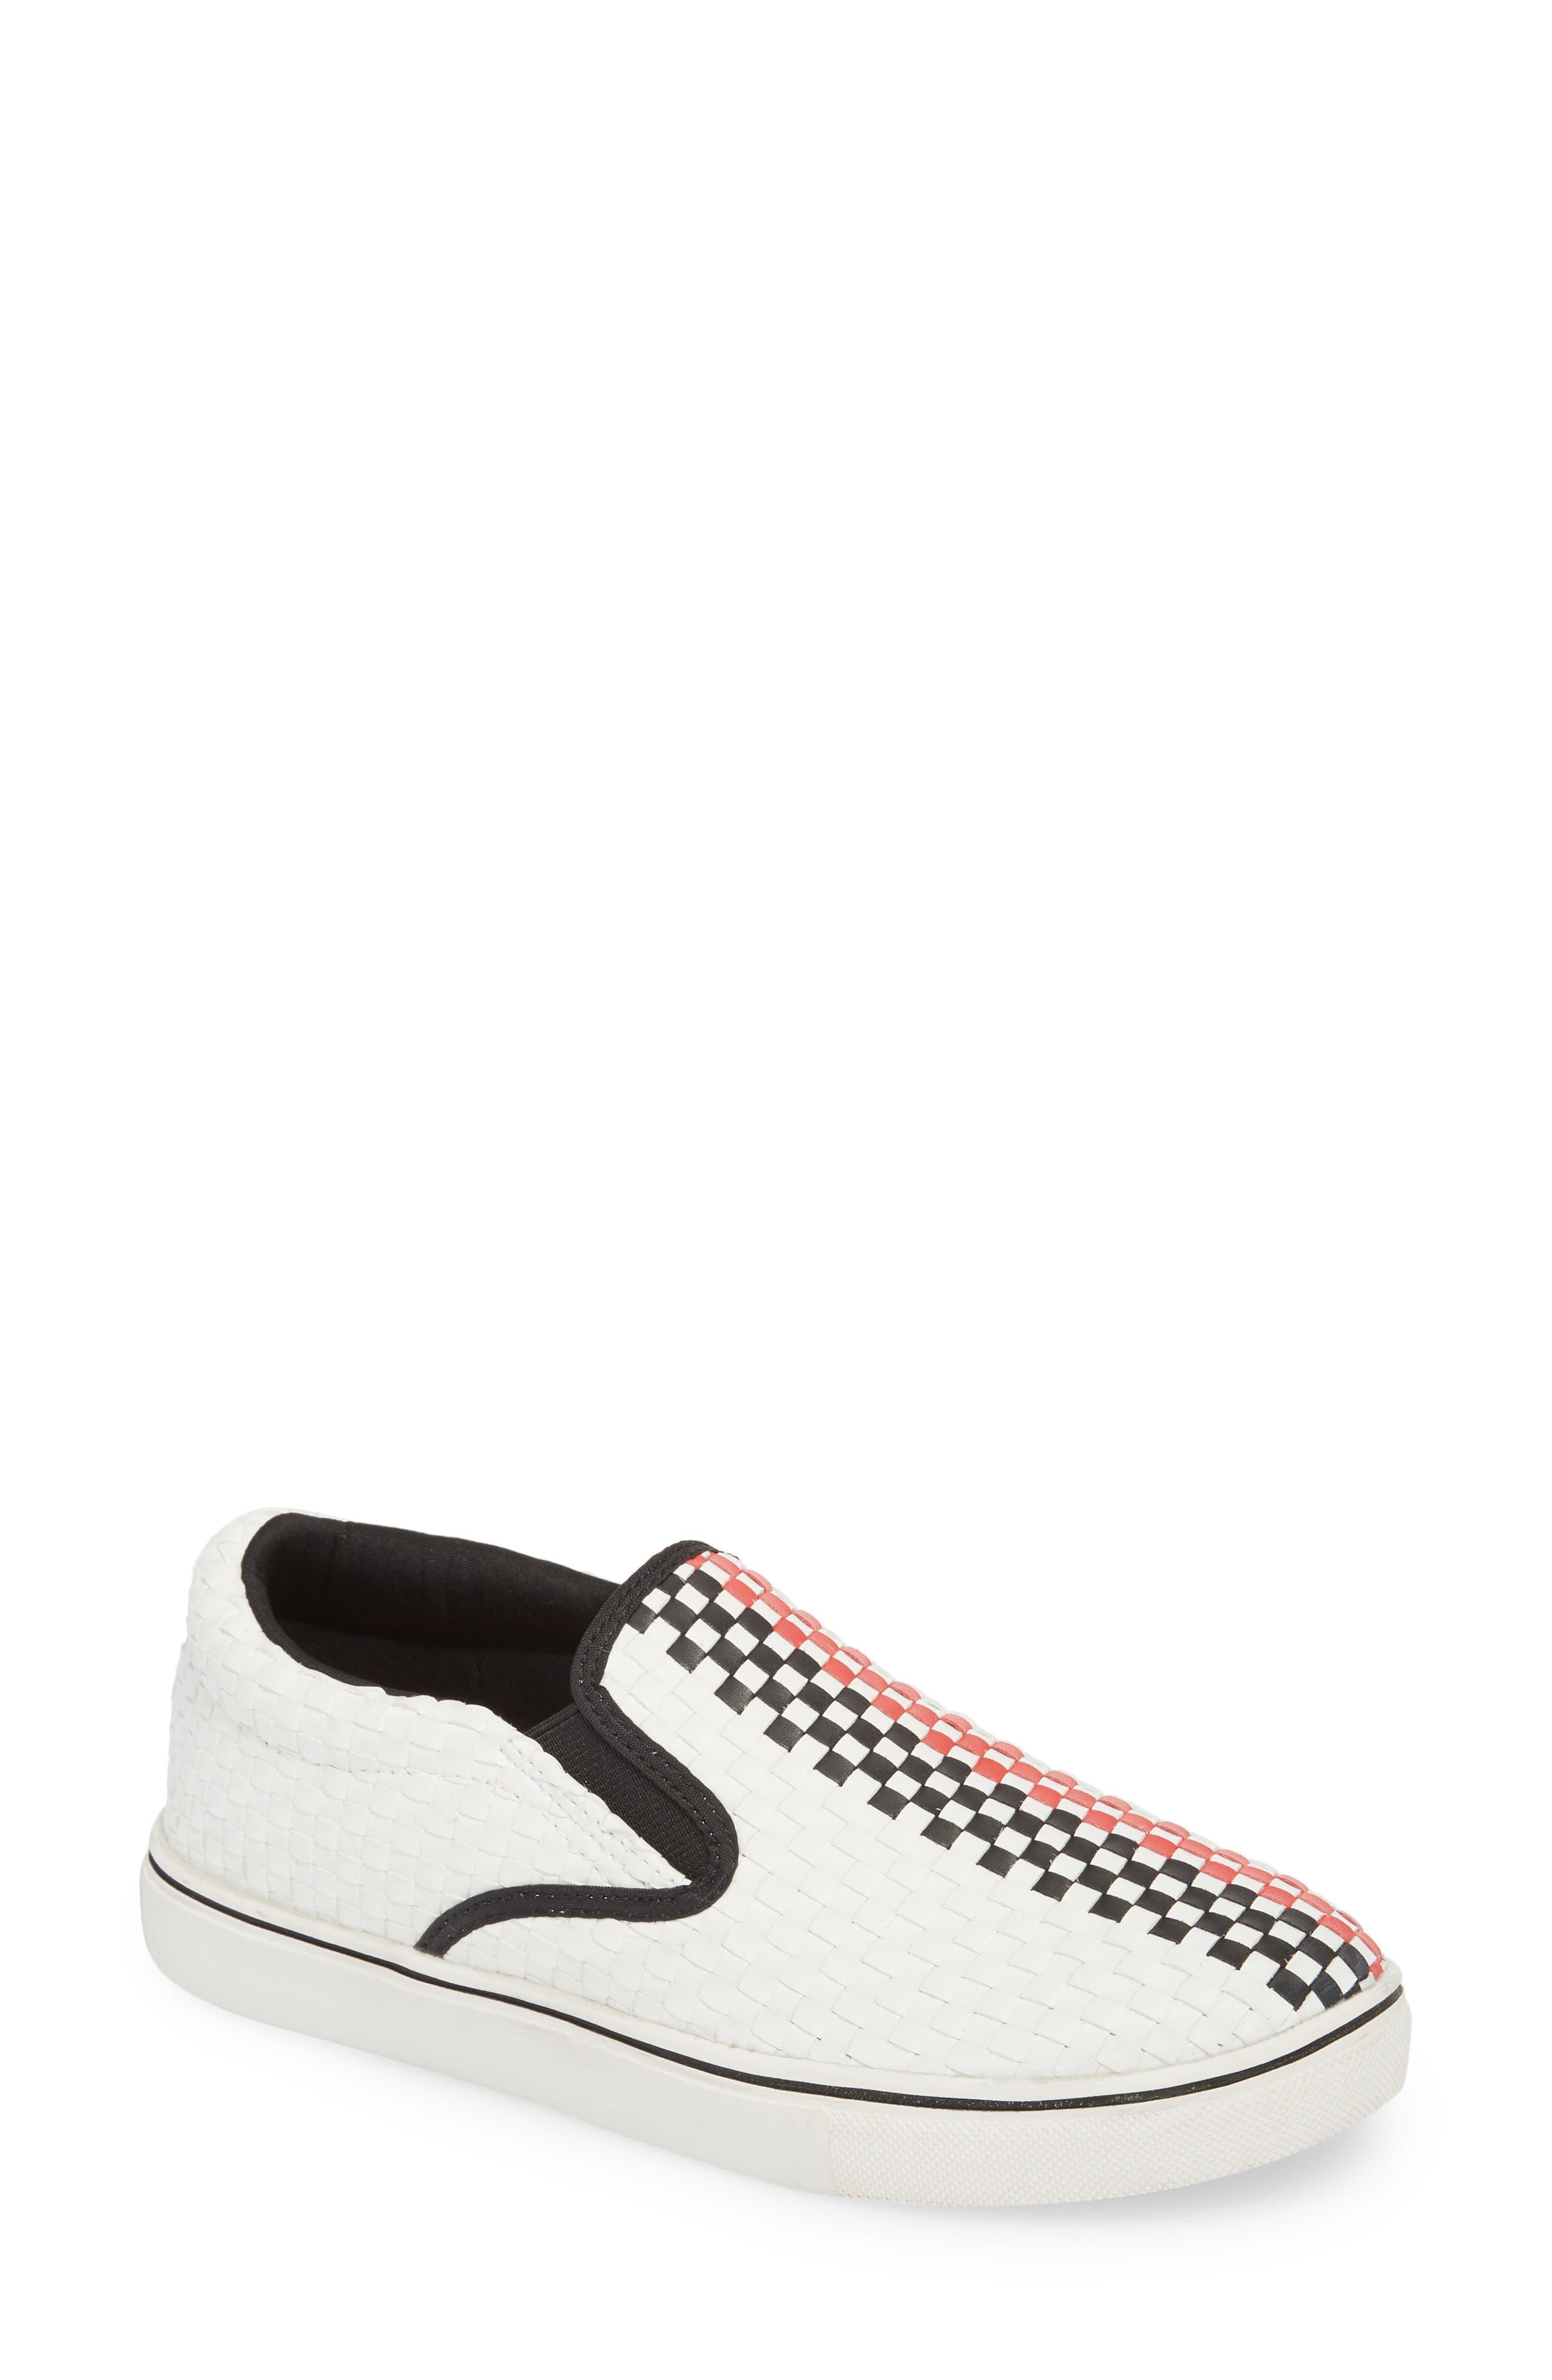 Bernie Mev. Checkerboard Slip-On Sneaker, White